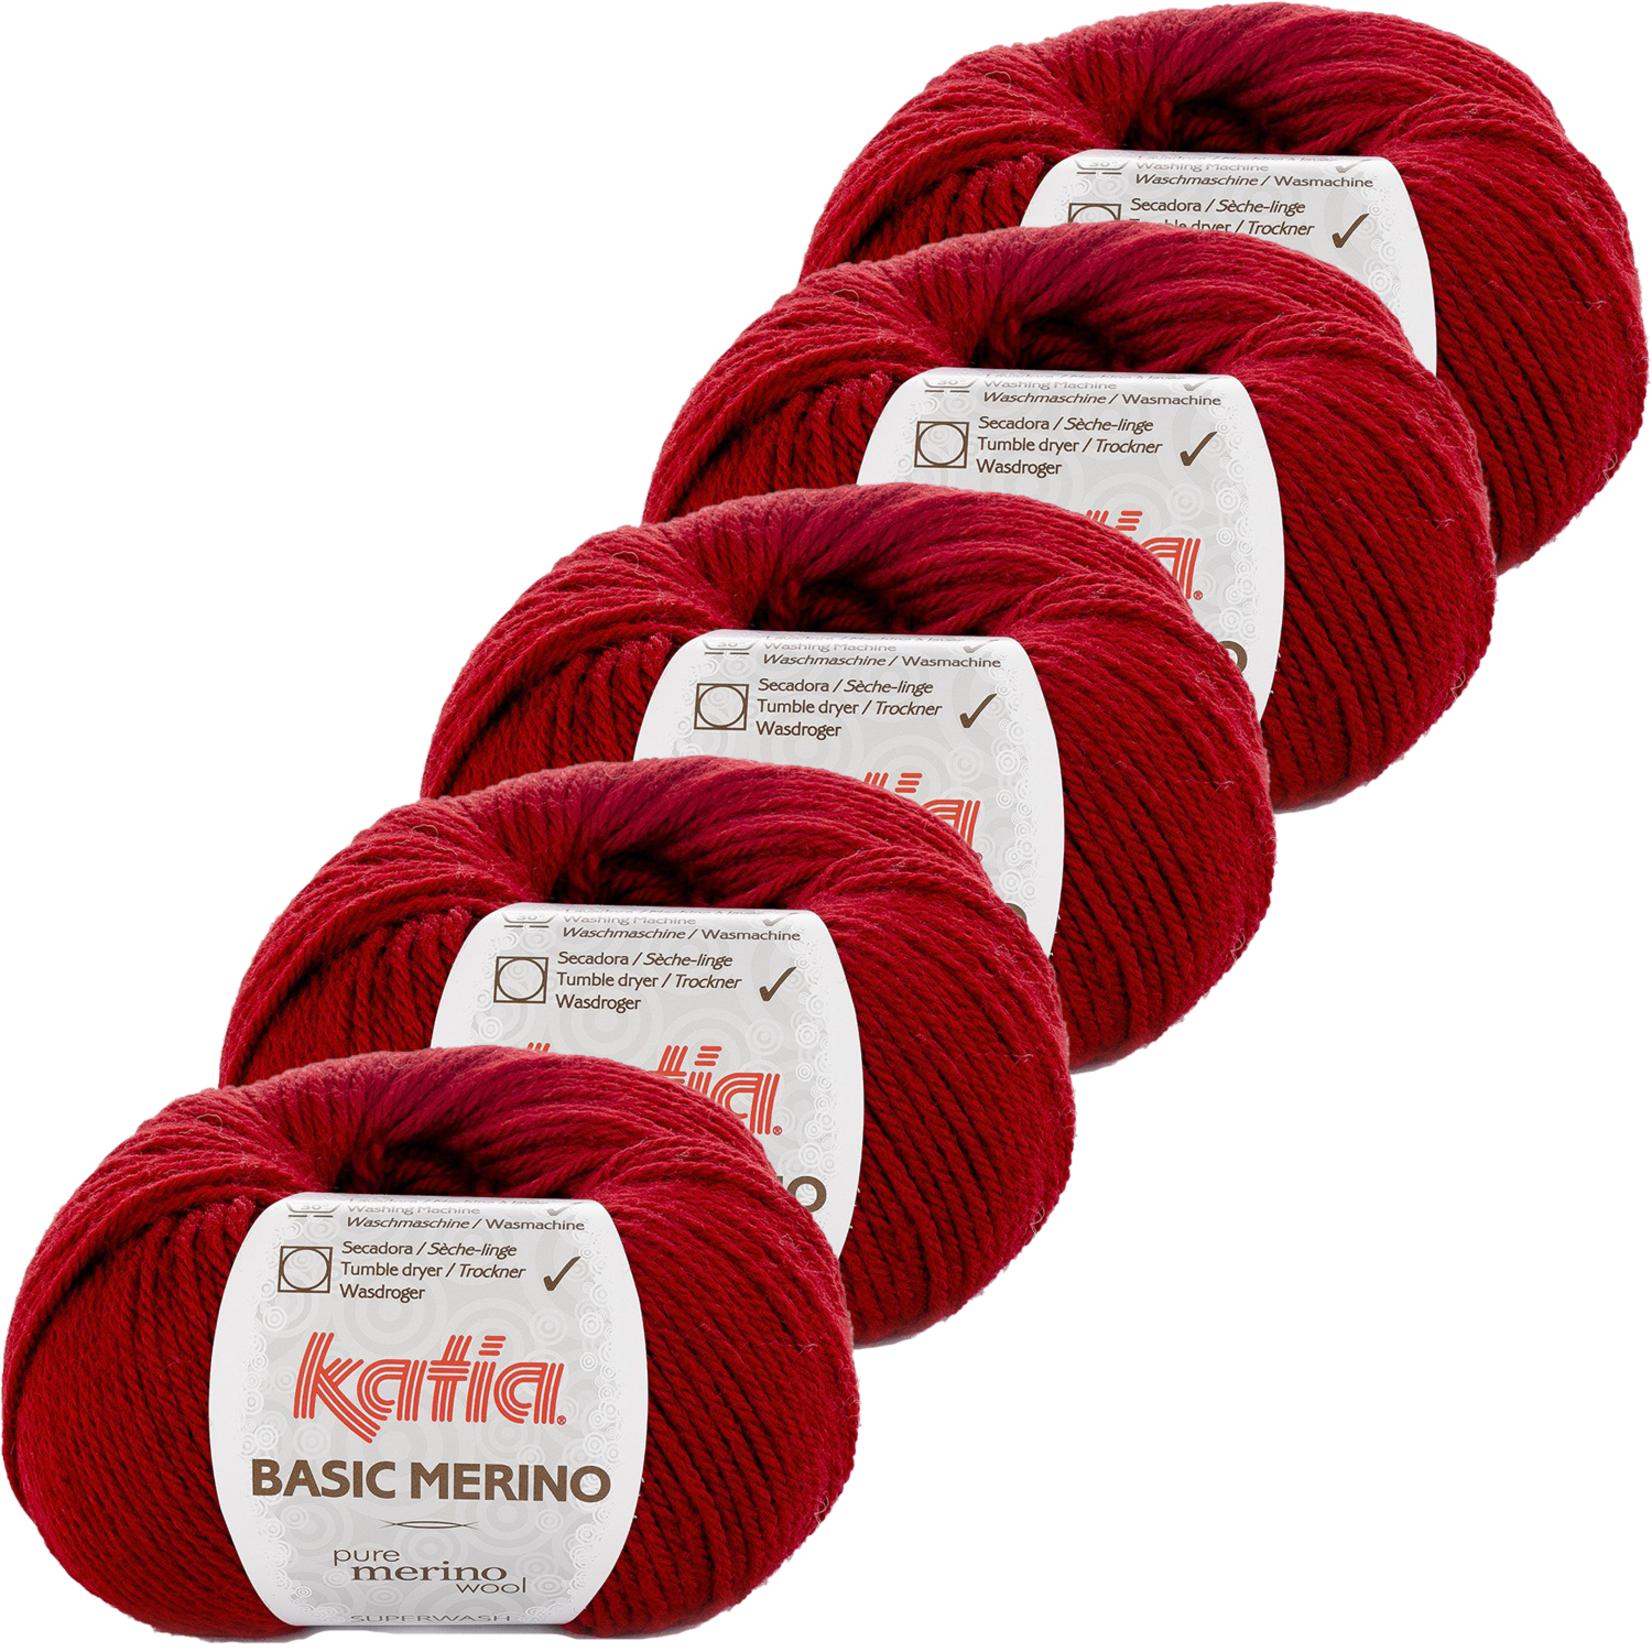 Katia Basic Merino - kleur 22_Wijnrood - bundel 5 bollen 50 gr.  van 120 m.